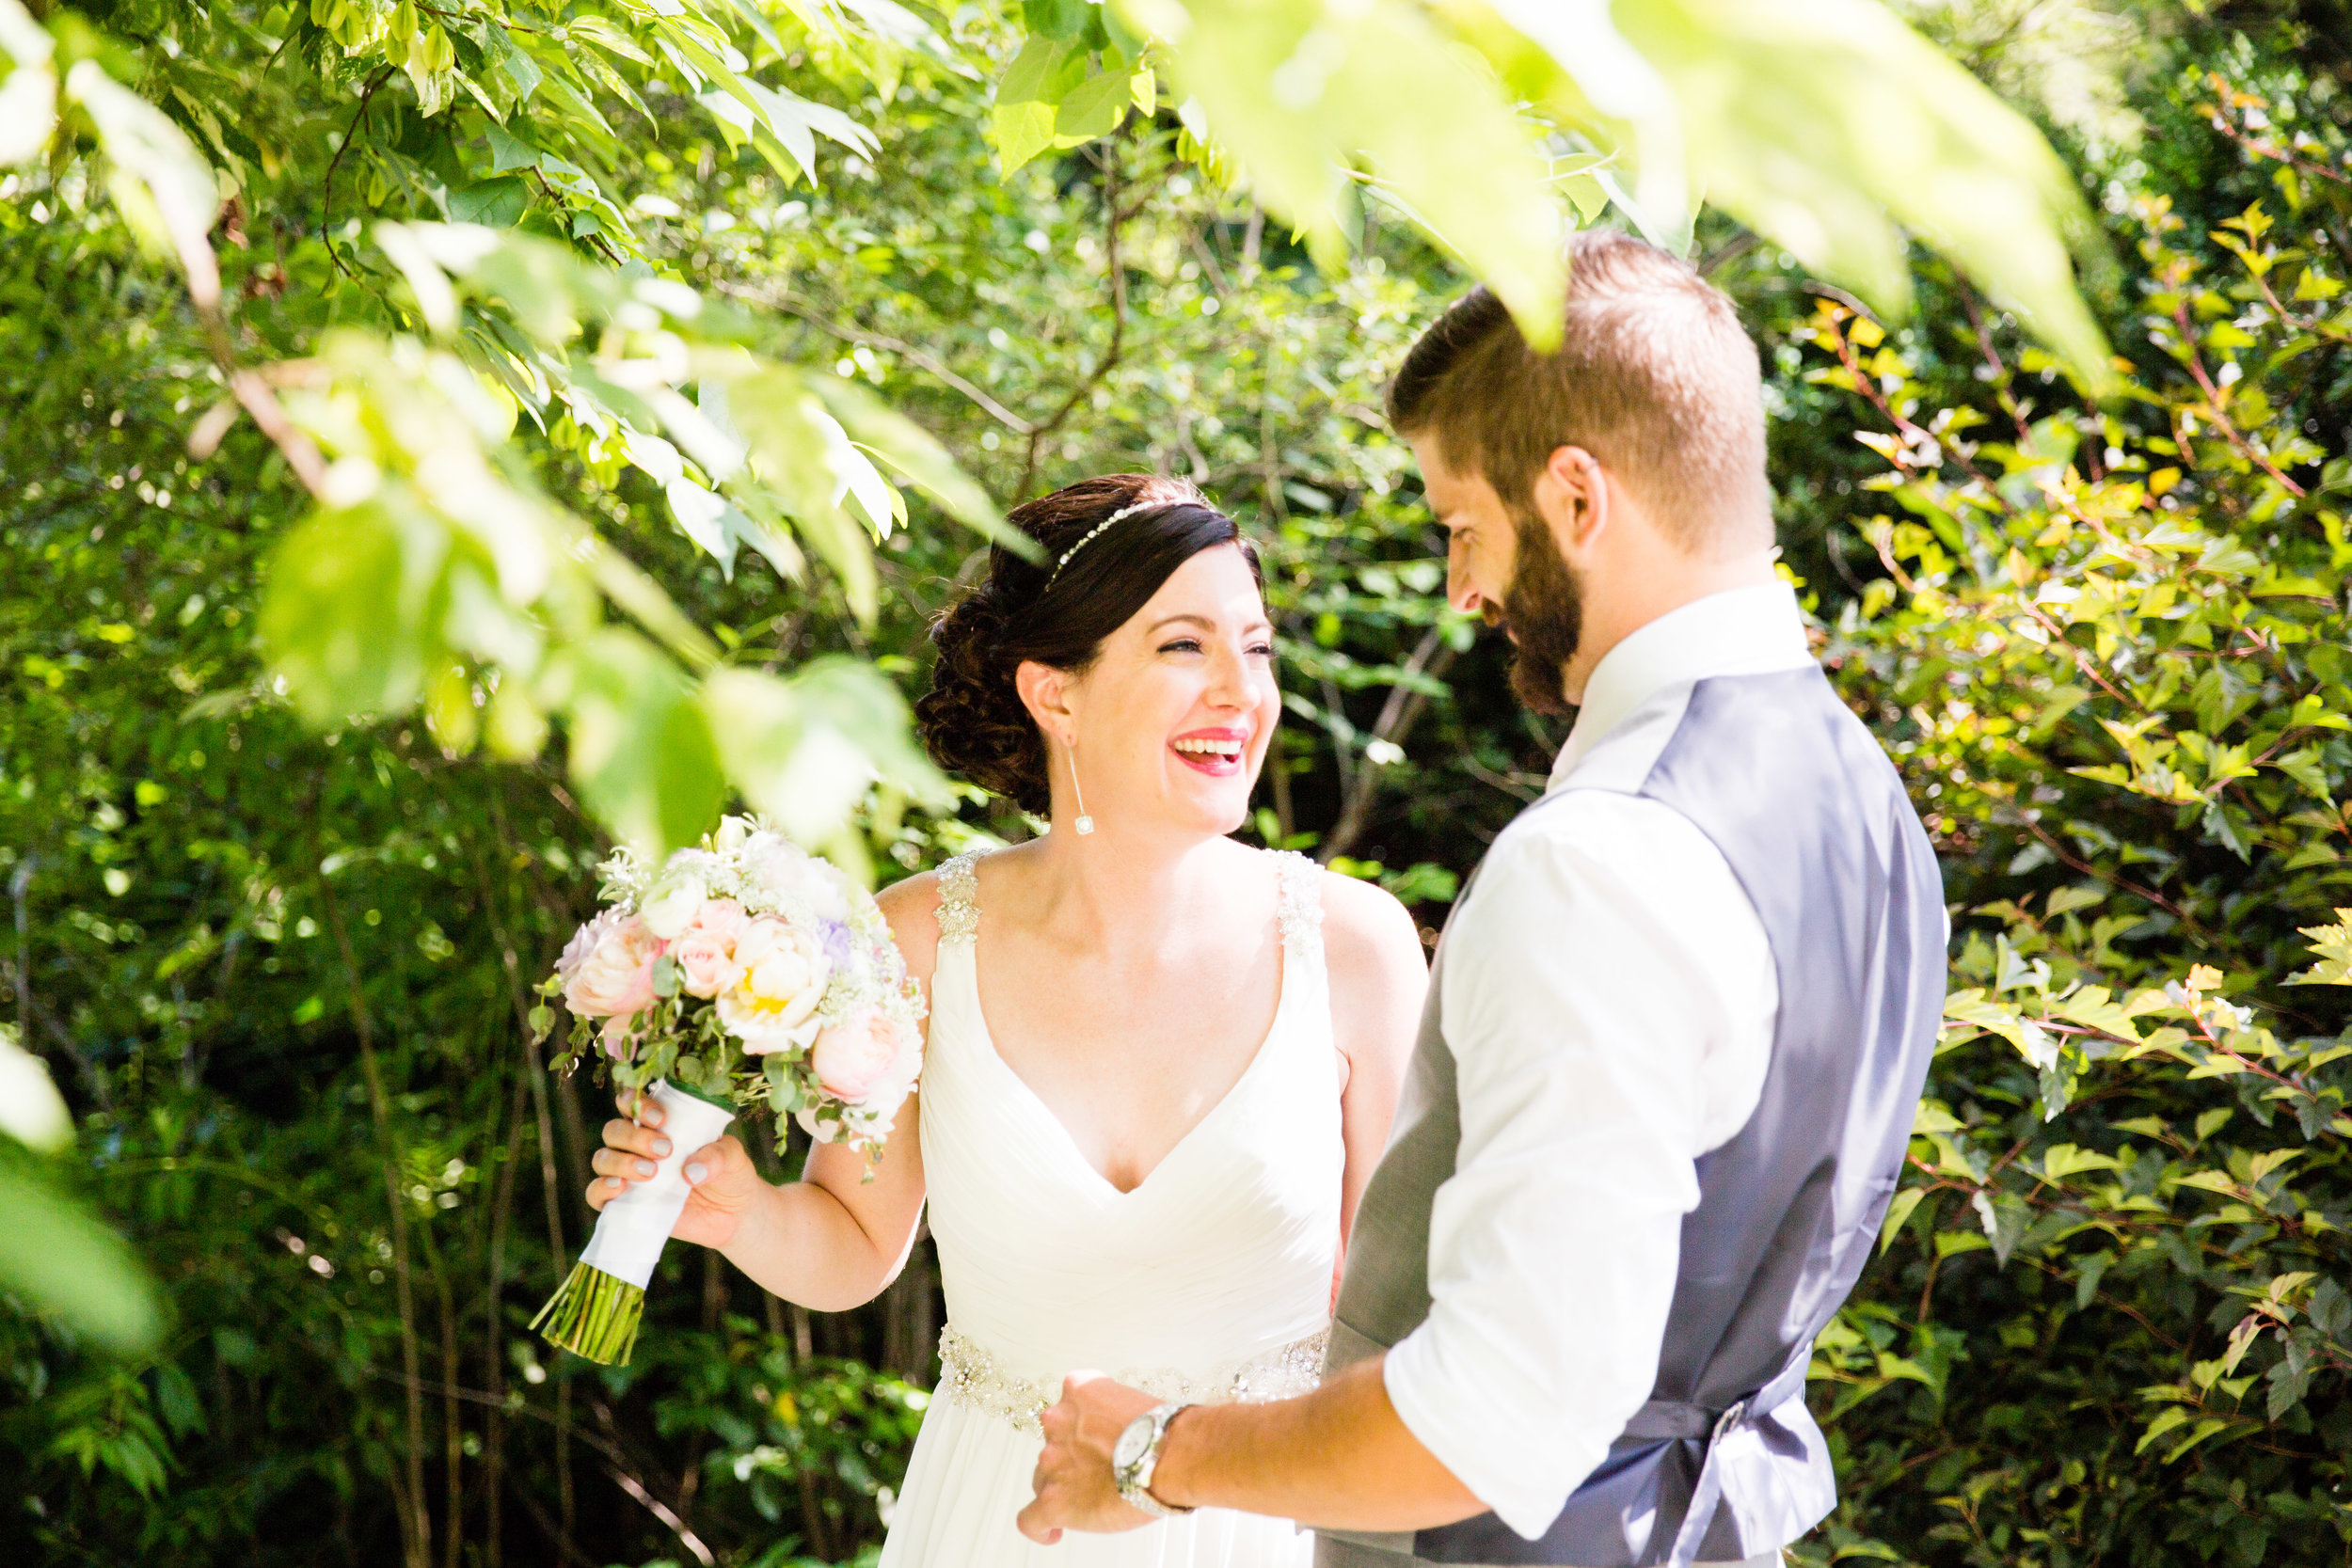 TYLER ARBORETUM WEDDING PHOTOGRAPHY LOVESTRUCK PICTURES-017.jpg